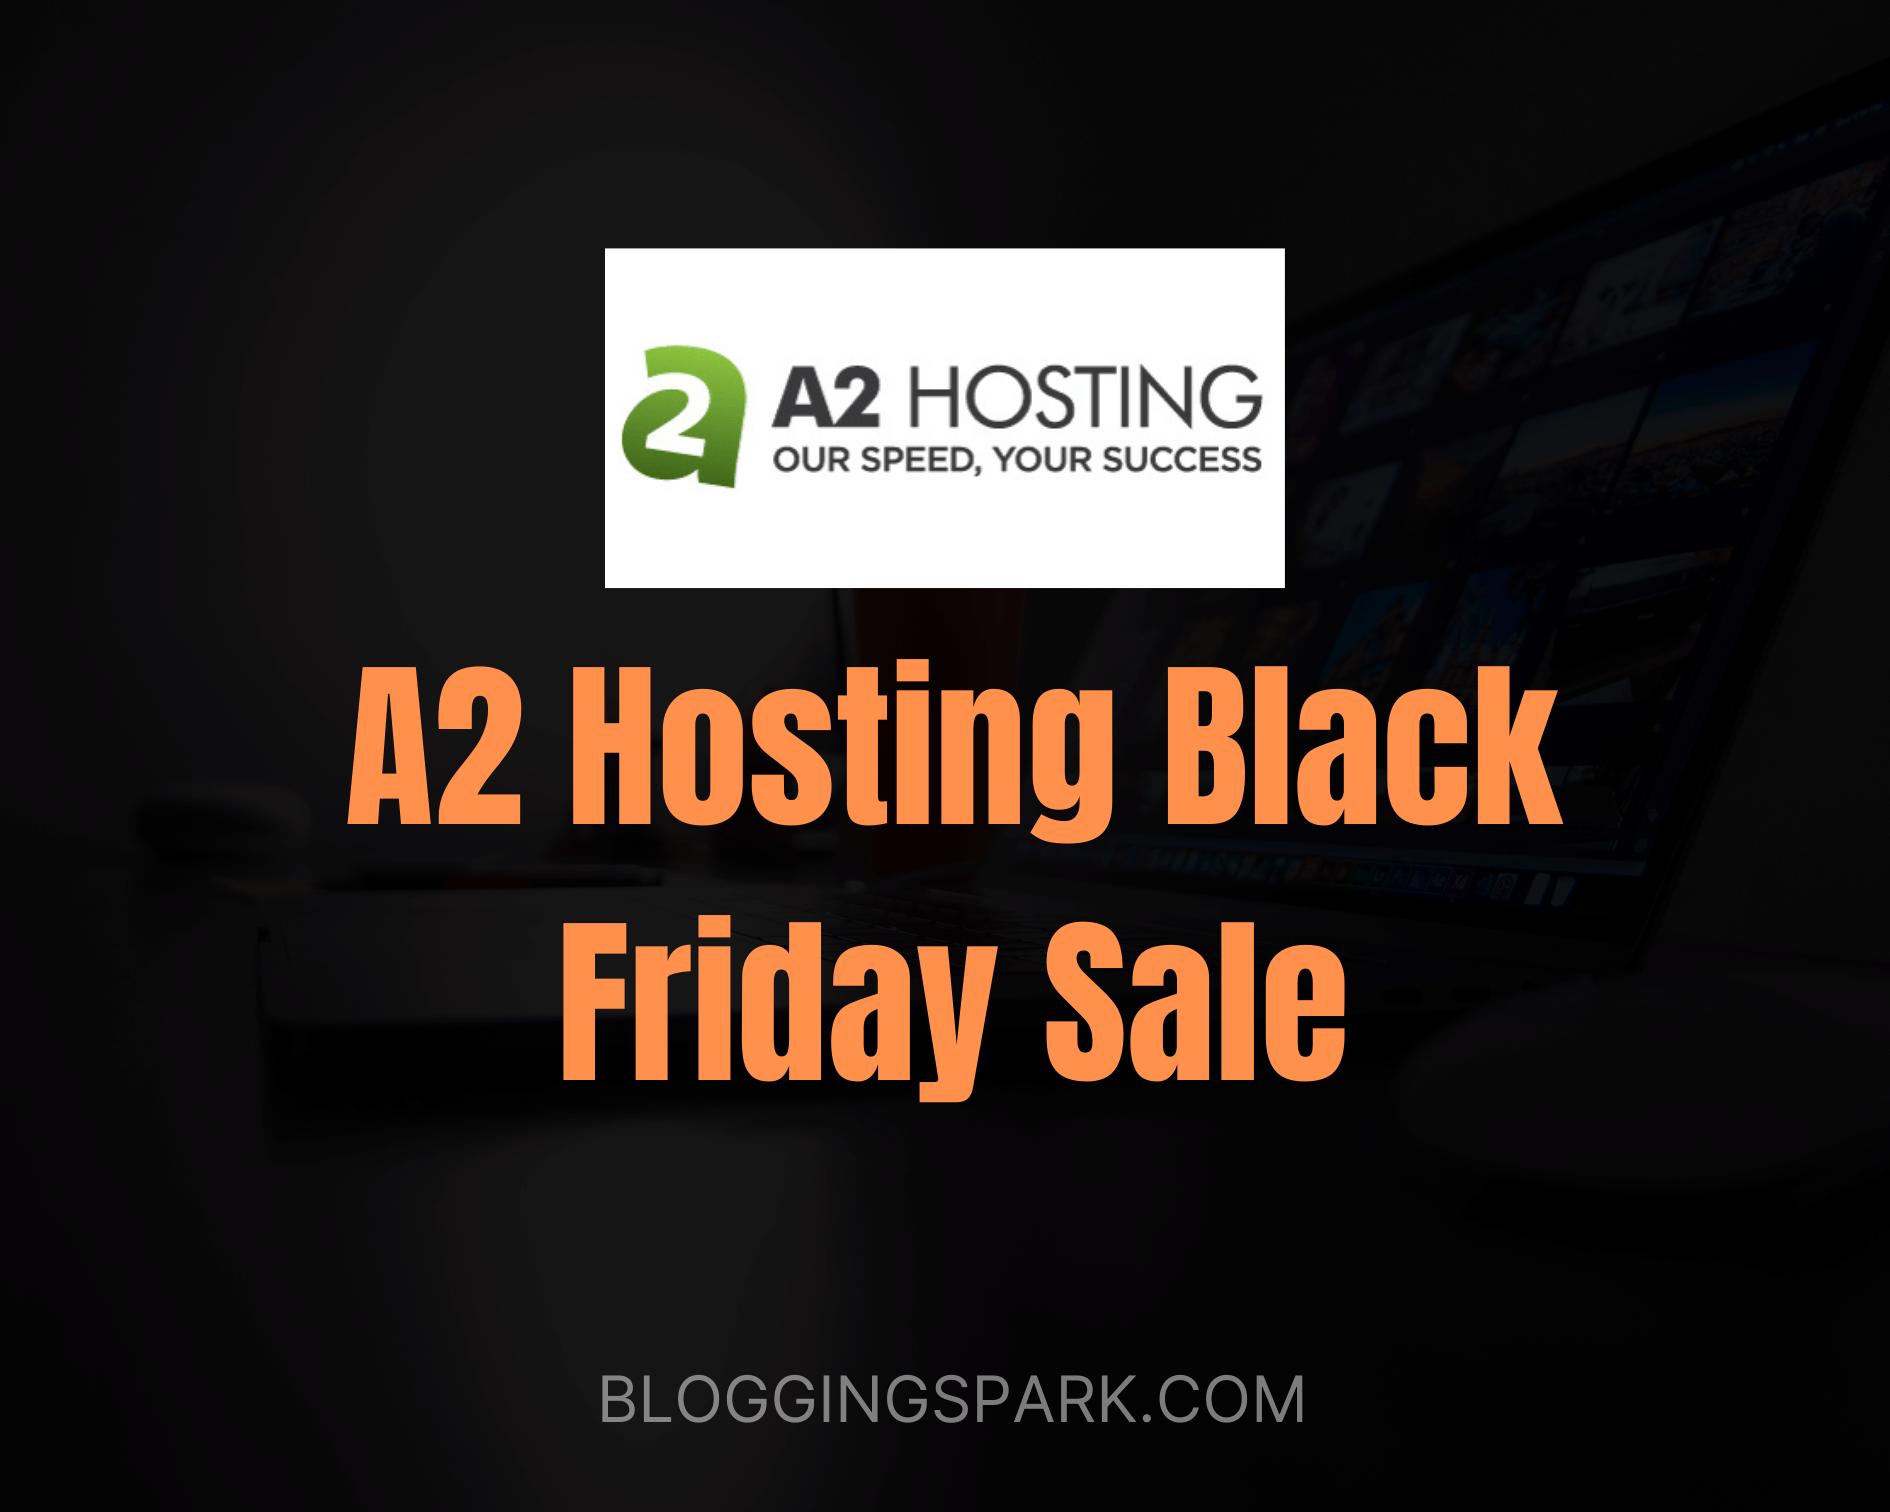 A2 Hosting Black Friday Deal 2020: 67% Discount $1.98/Mo